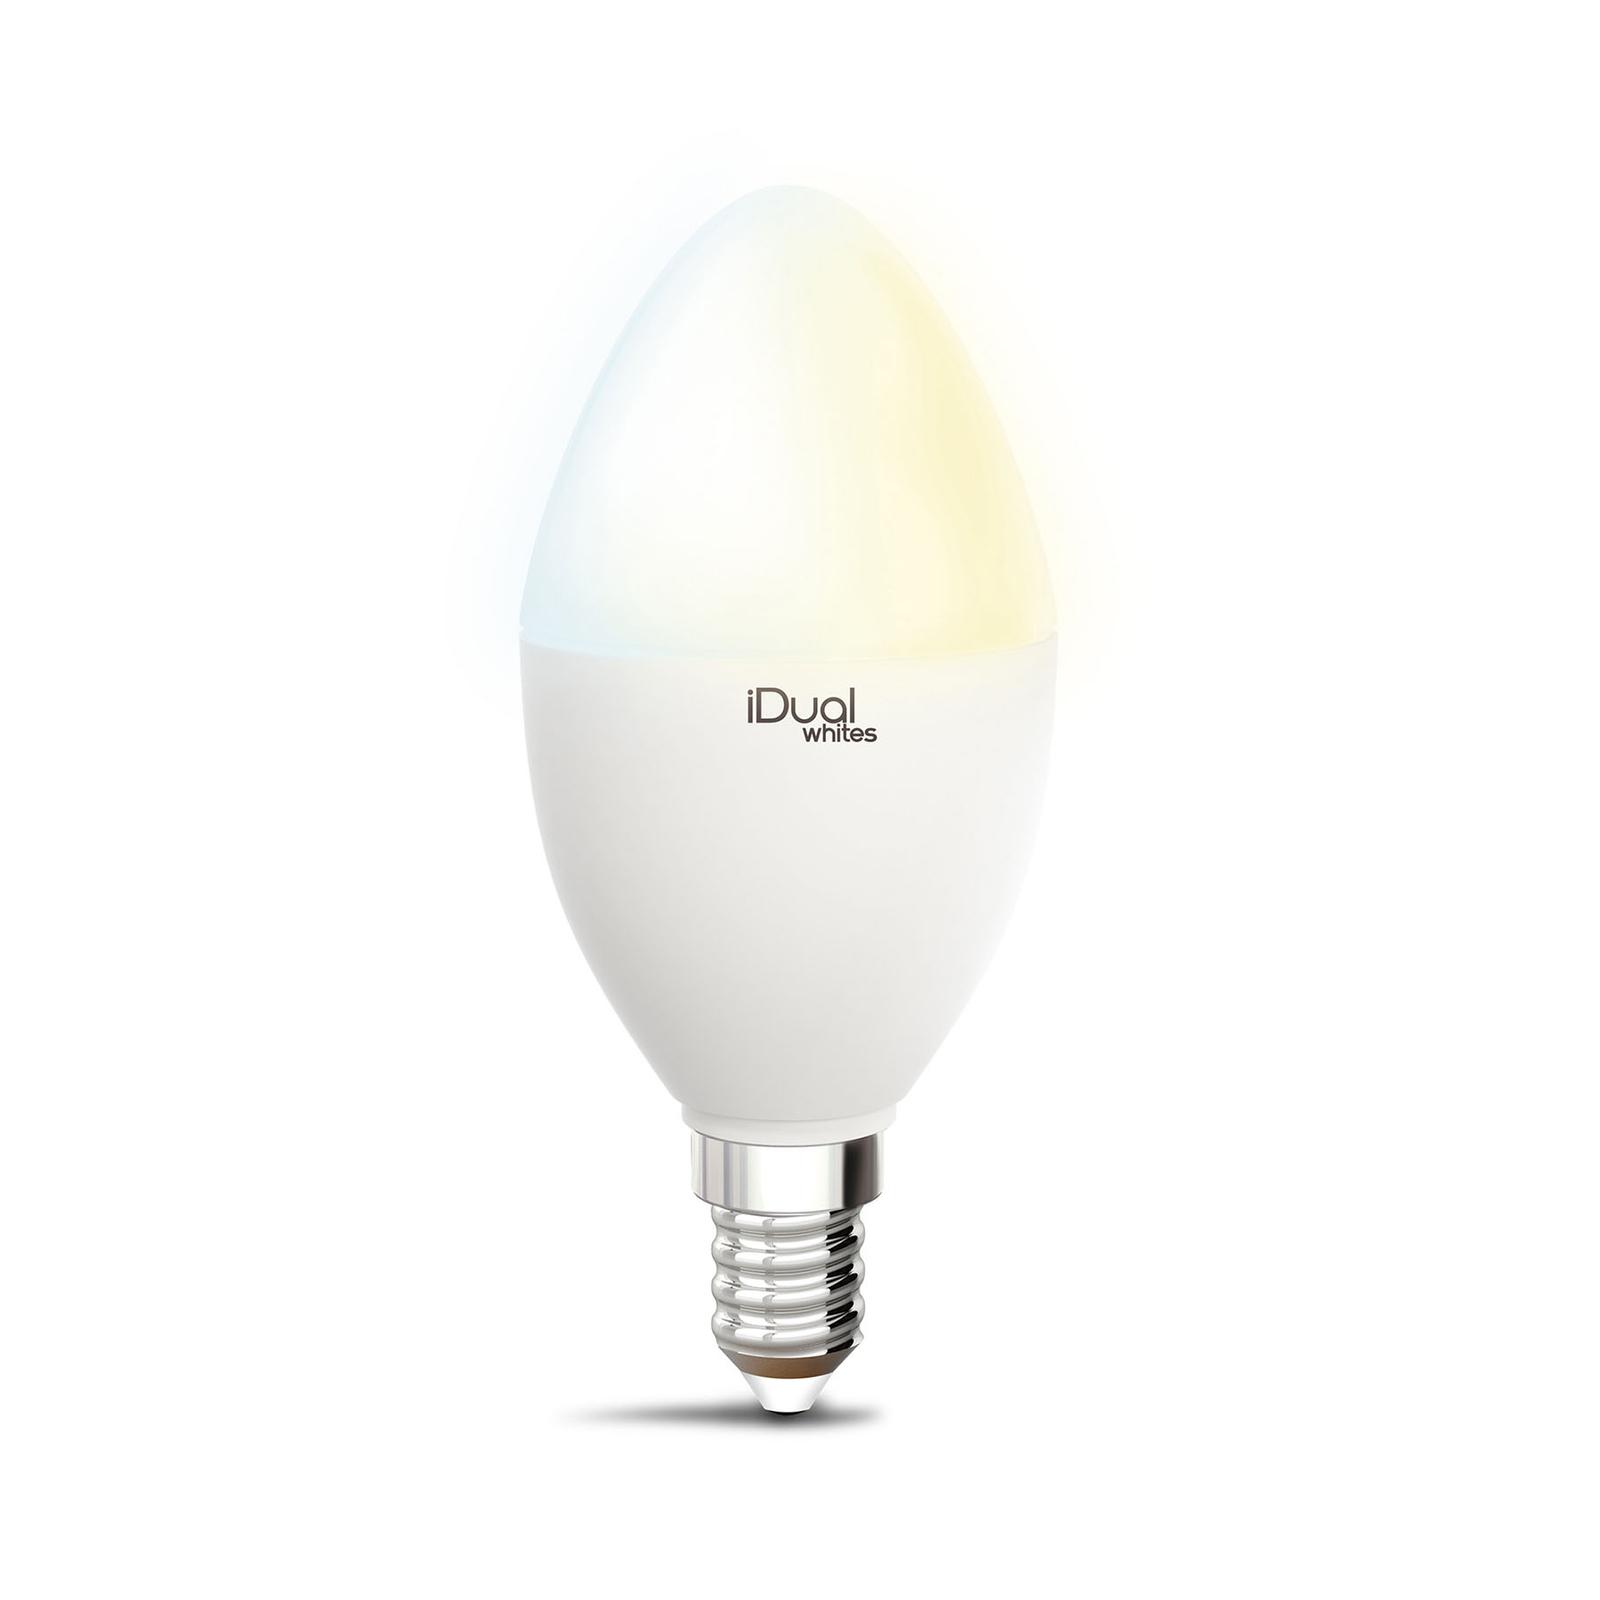 iDual Whites LED-pære mignon P45 E14 5,5W